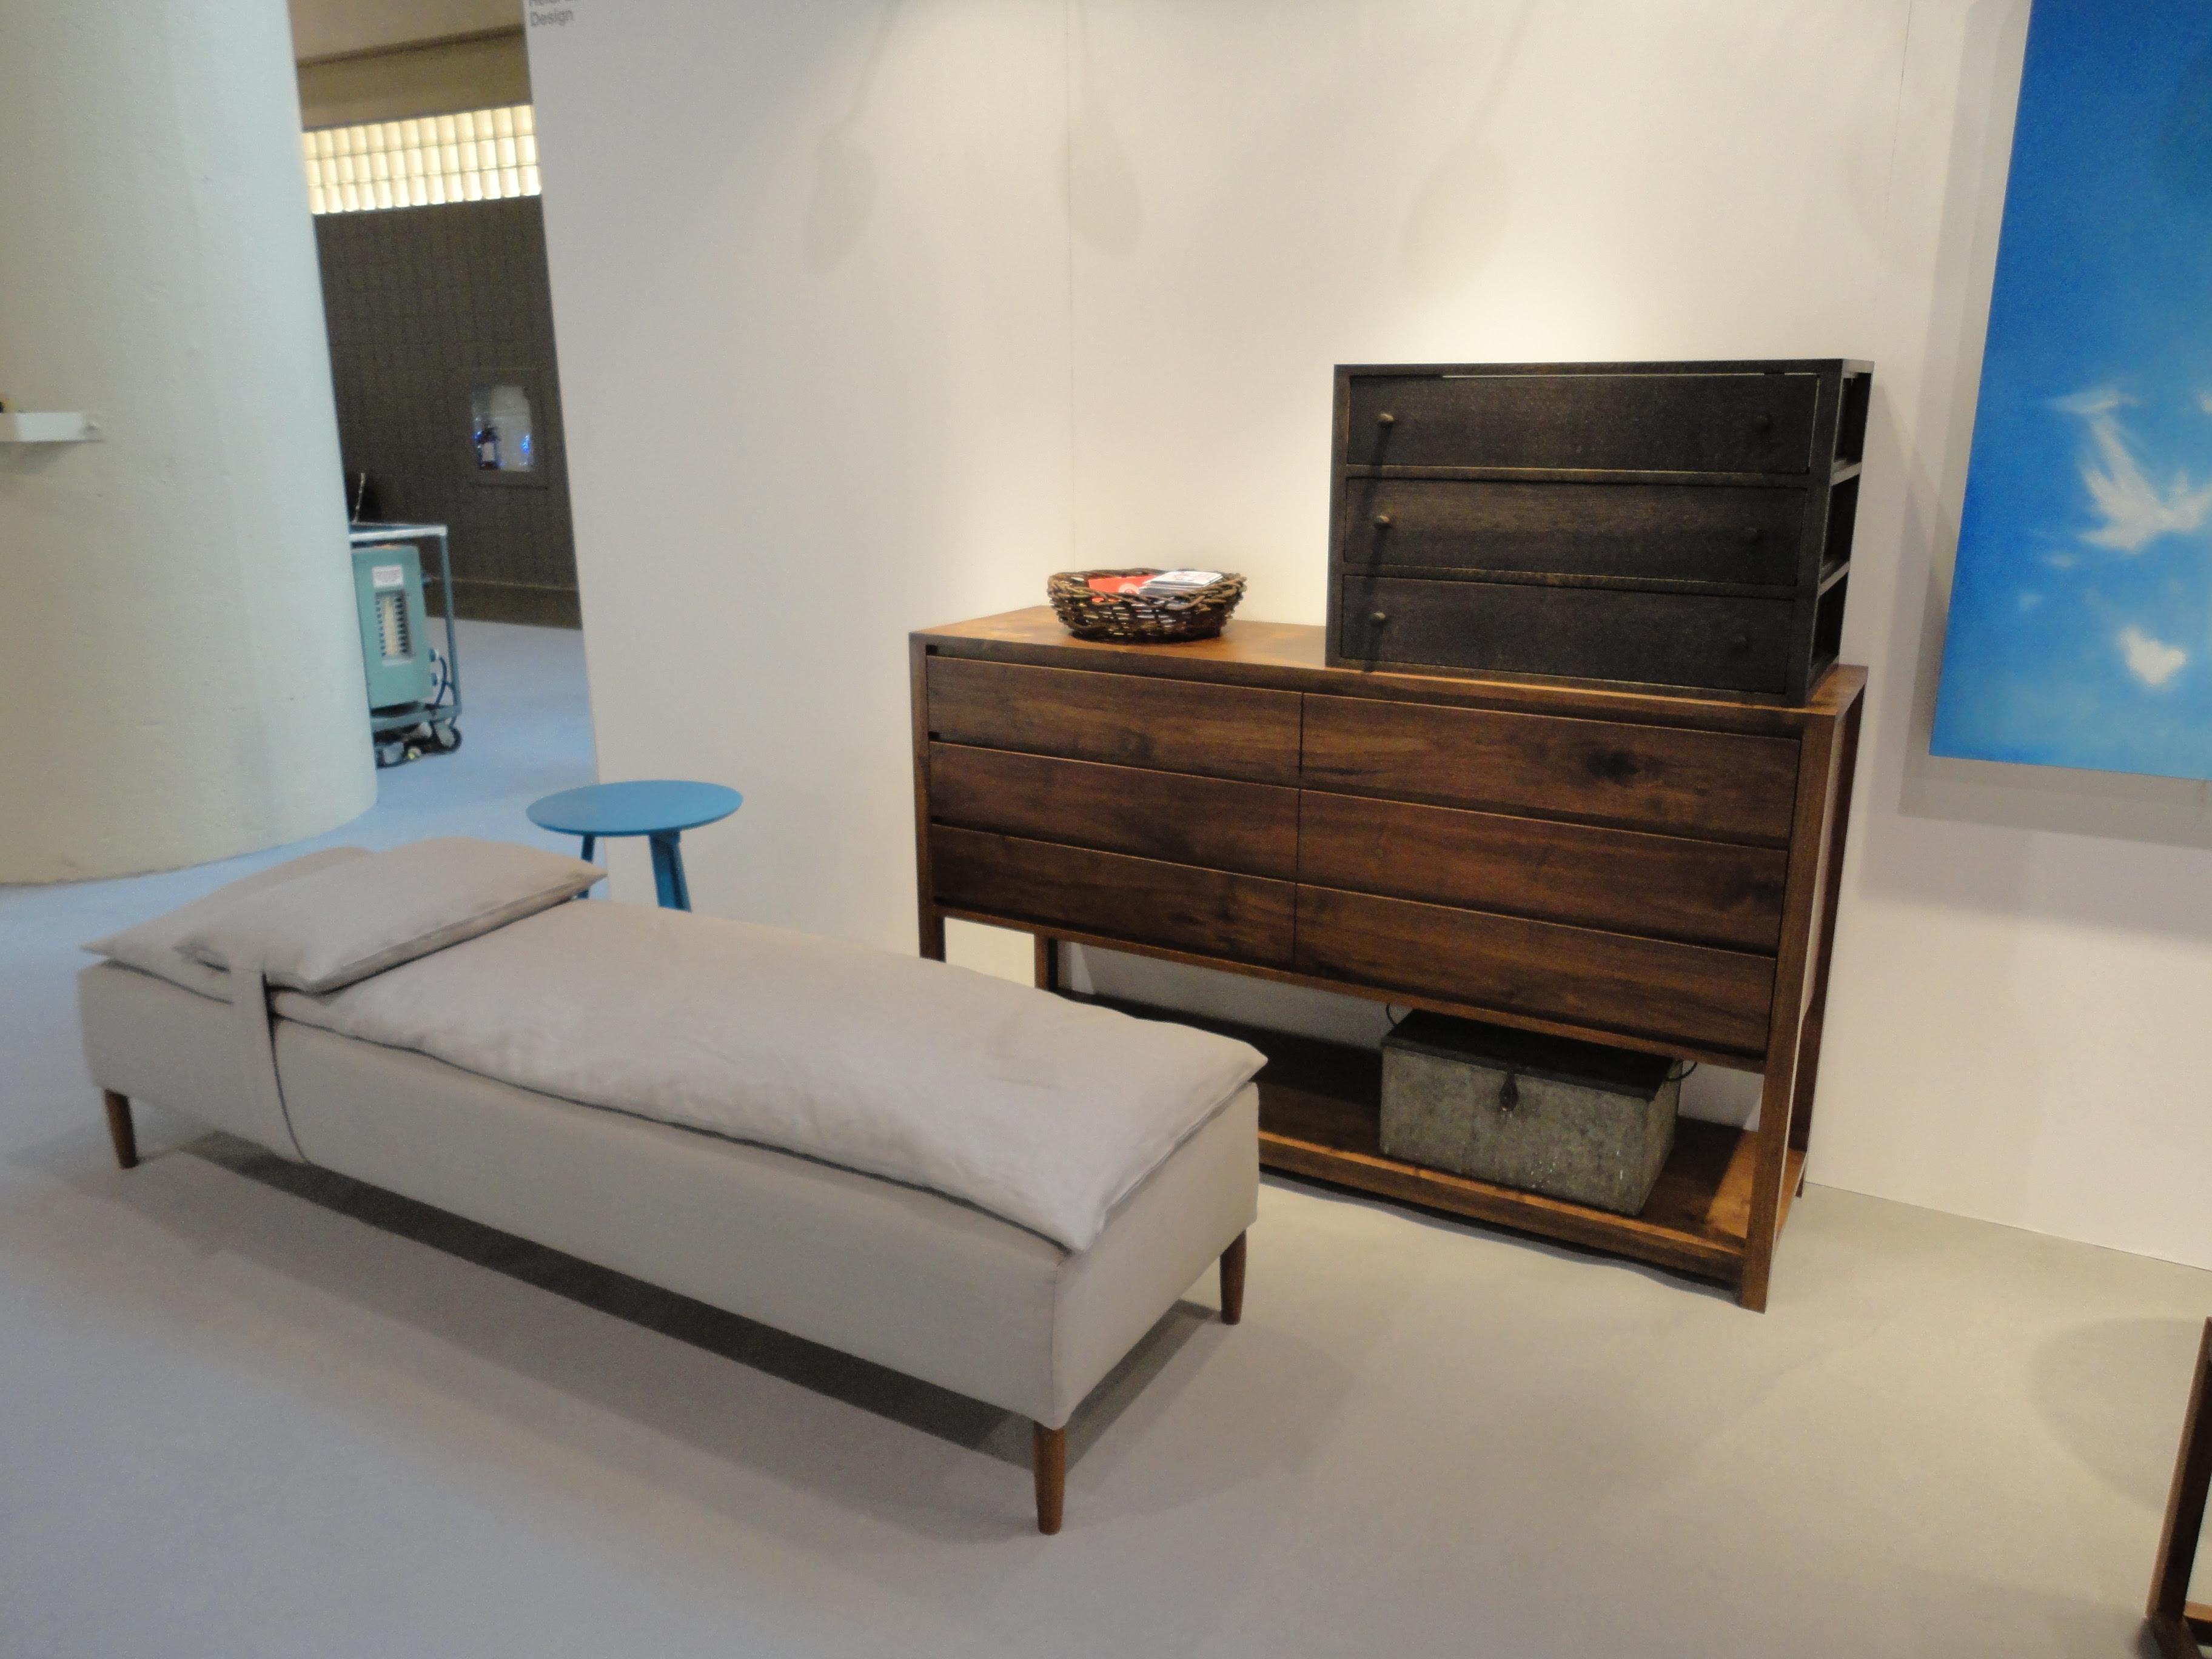 IDS12 Interior Design Show Toronto | Gillian Gillies's Interiors Blog